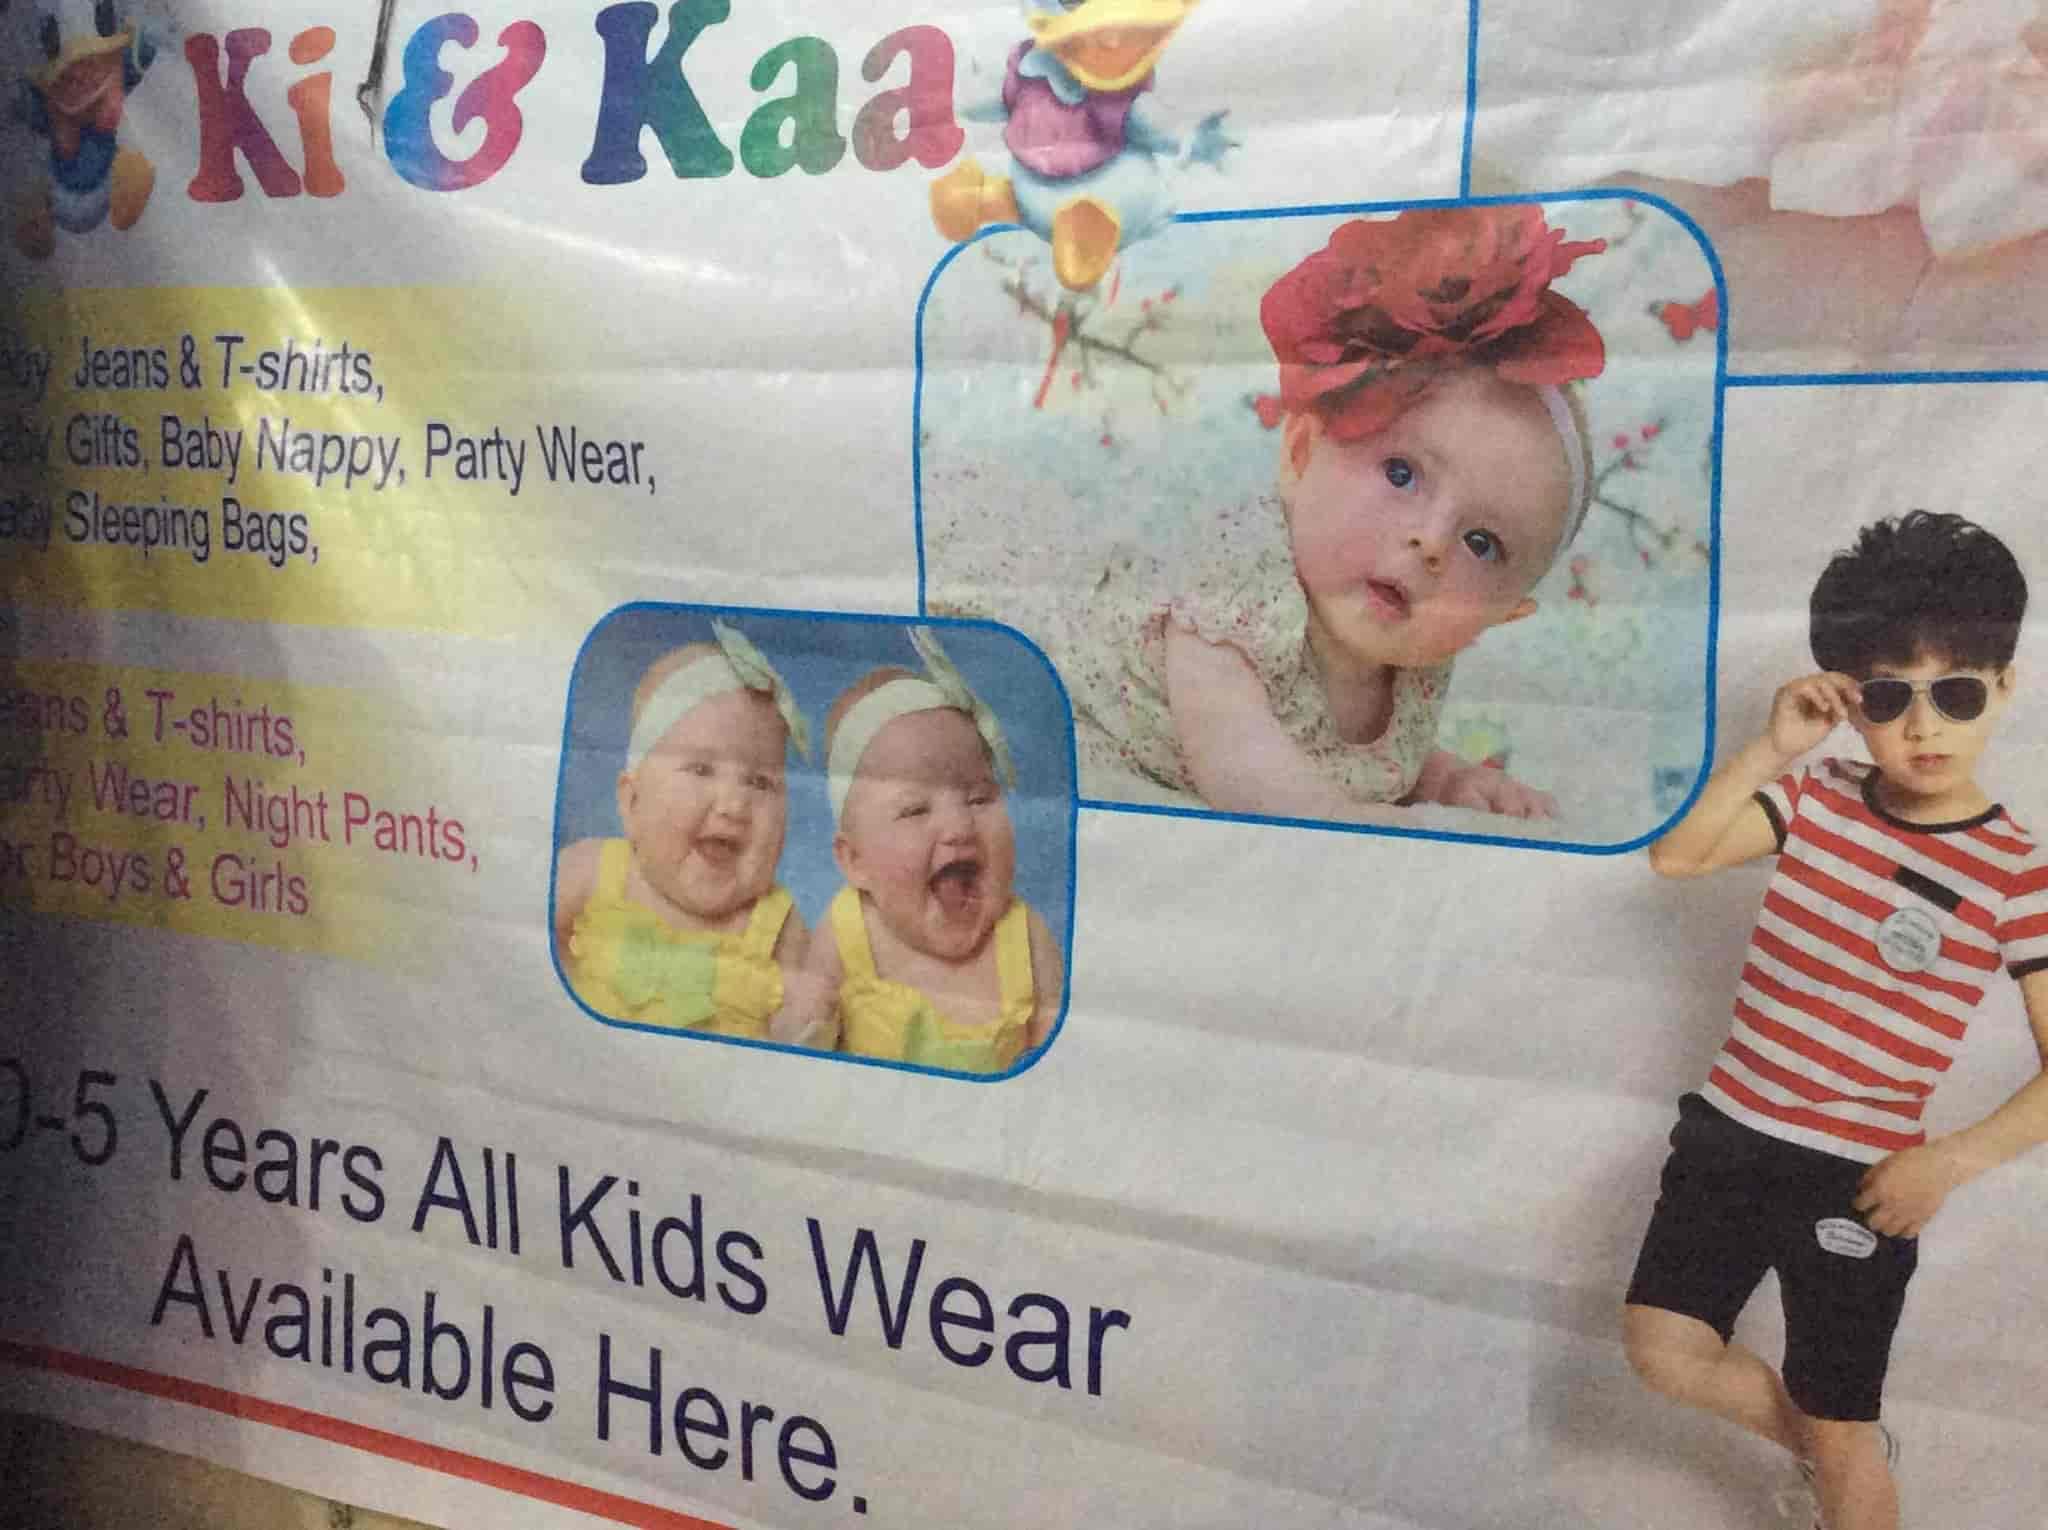 Baby ki and kaa photos sahakar nagar pune children readymade garment retailers